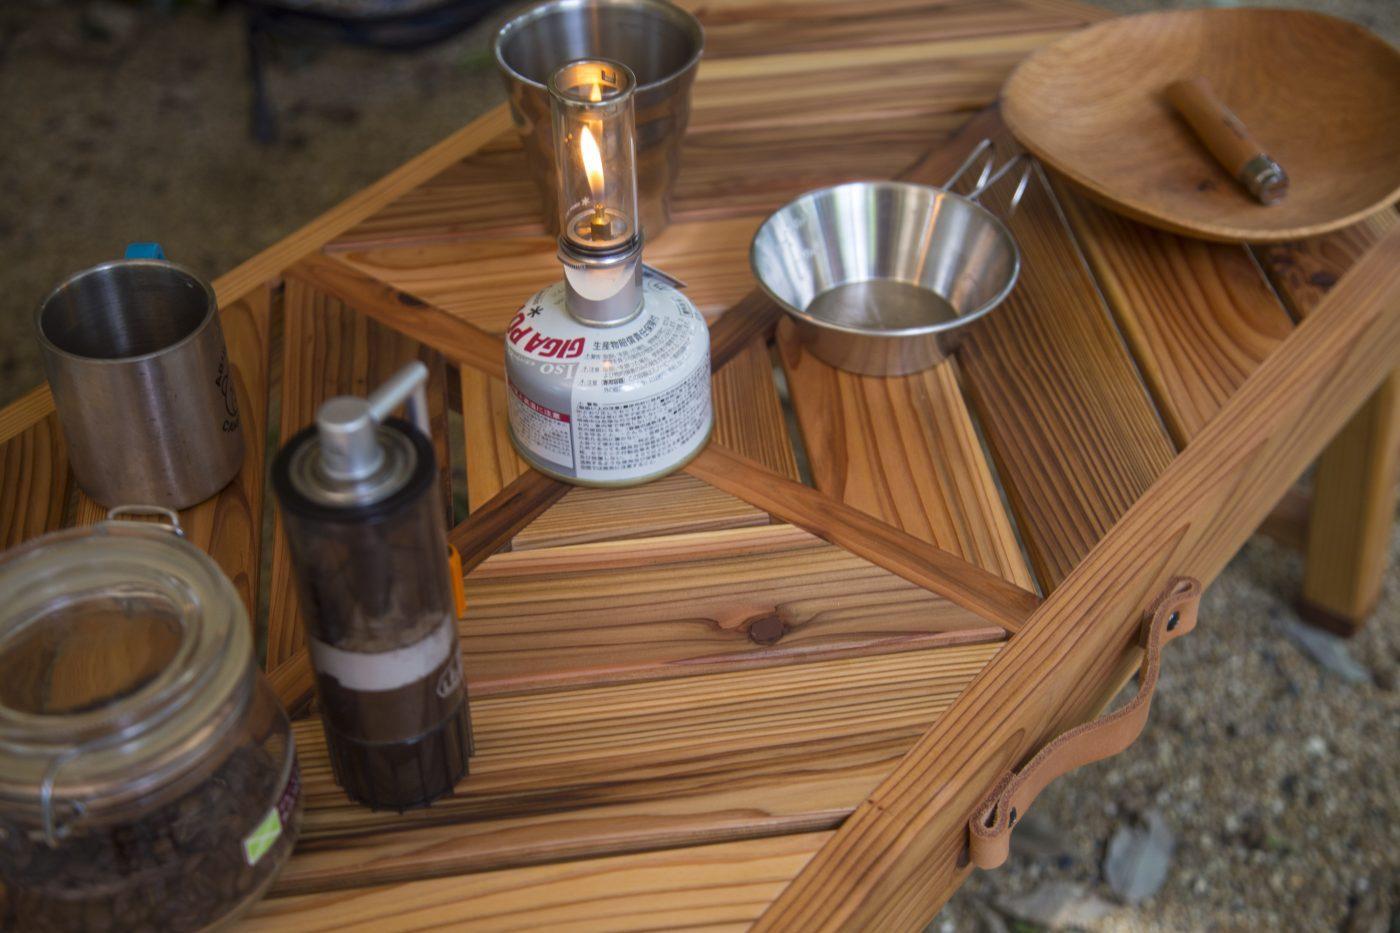 kokazeのテーブルはキャンプにオススメ